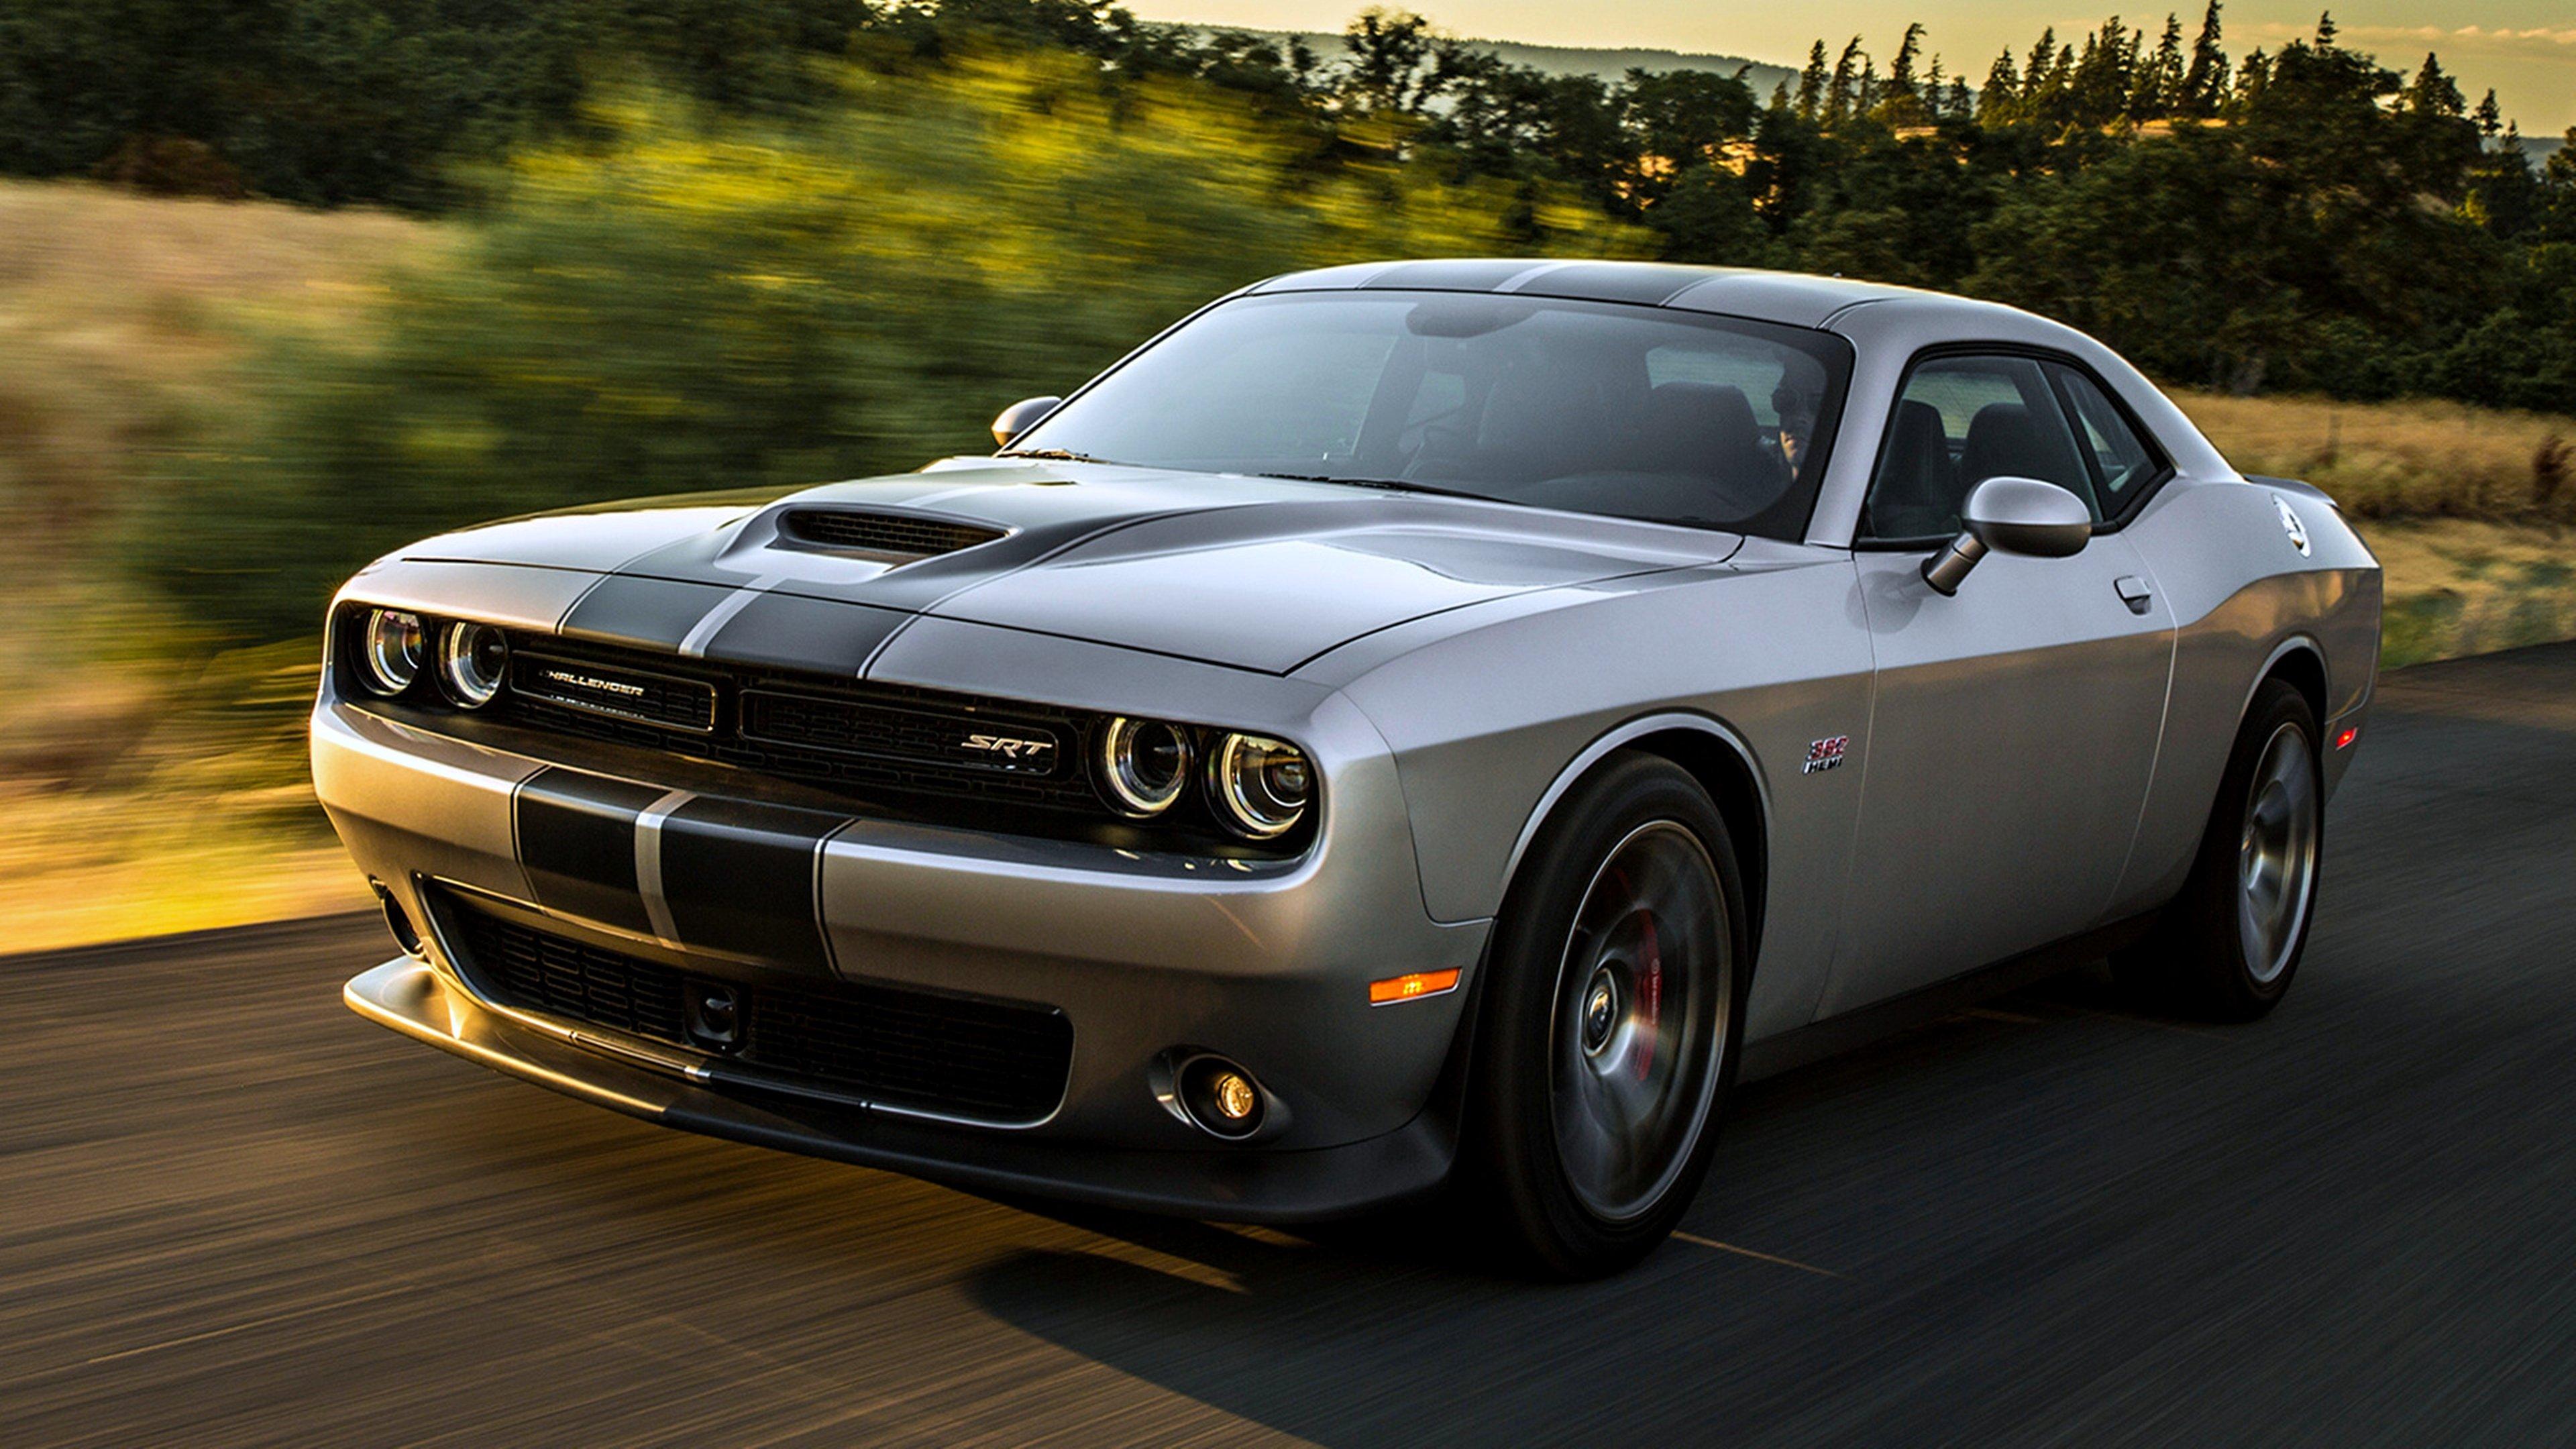 2015 Dodge Challenger Srt 392 Gray Silver Road Speed